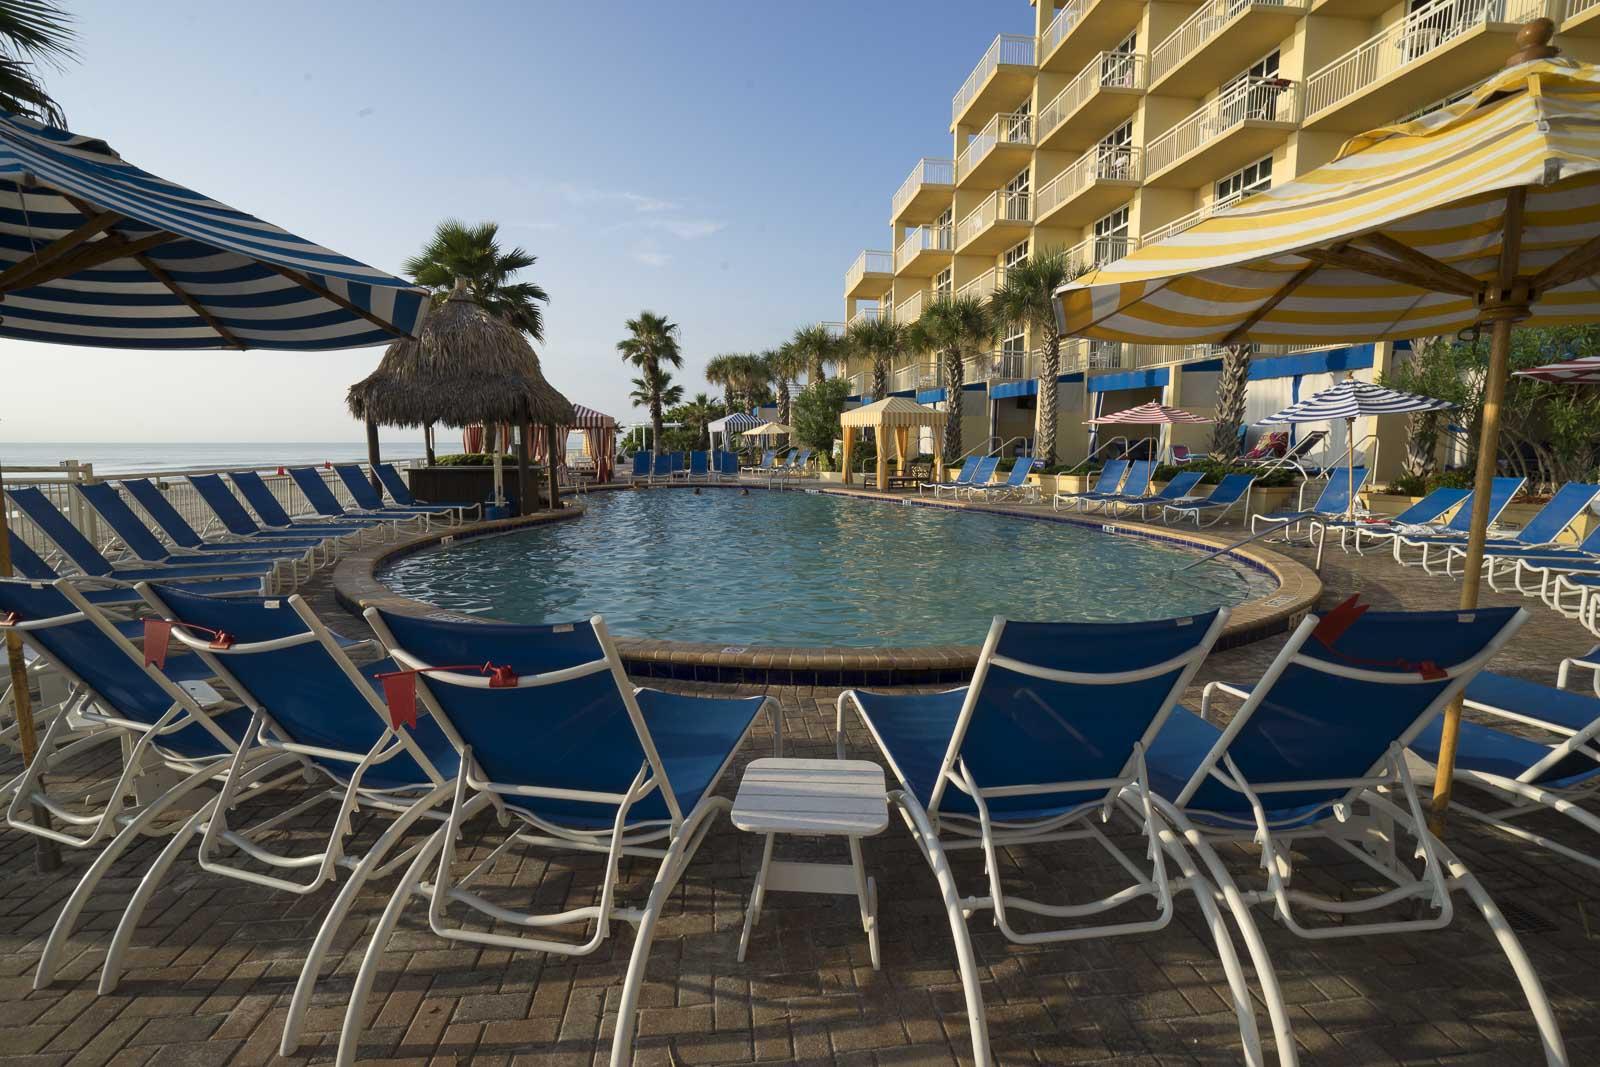 Daytona Beach Shores Hotel poolside